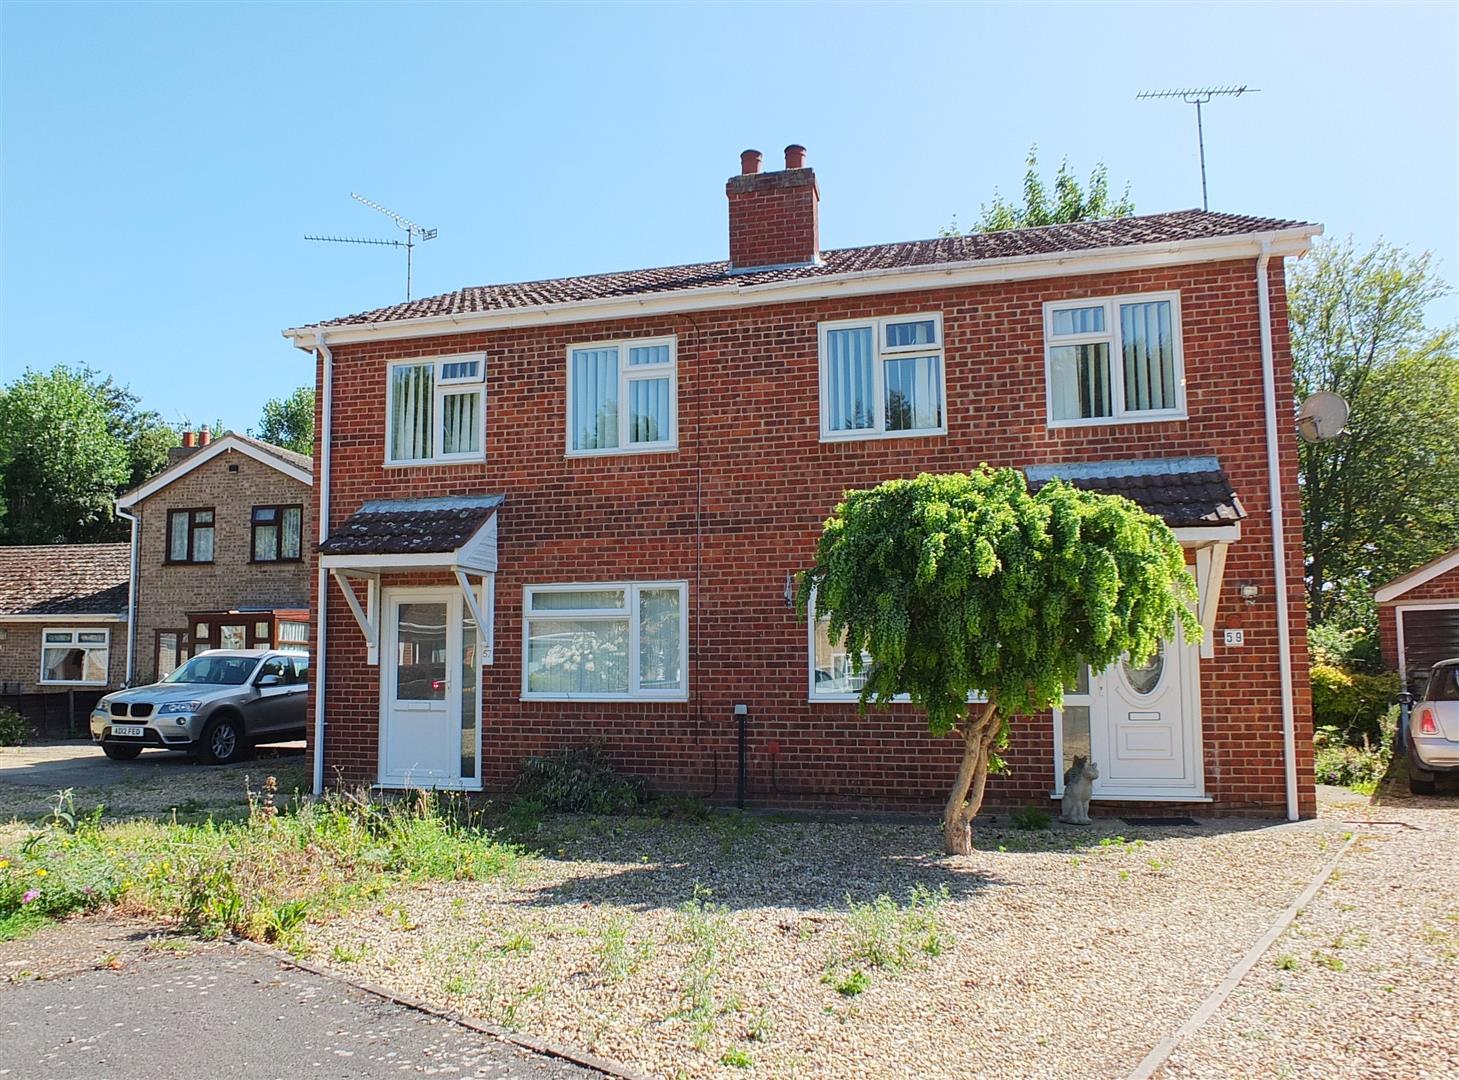 3 bed semi-detached house for sale in Sutton Bridge Spalding, PE12 9TZ  - Property Image 1